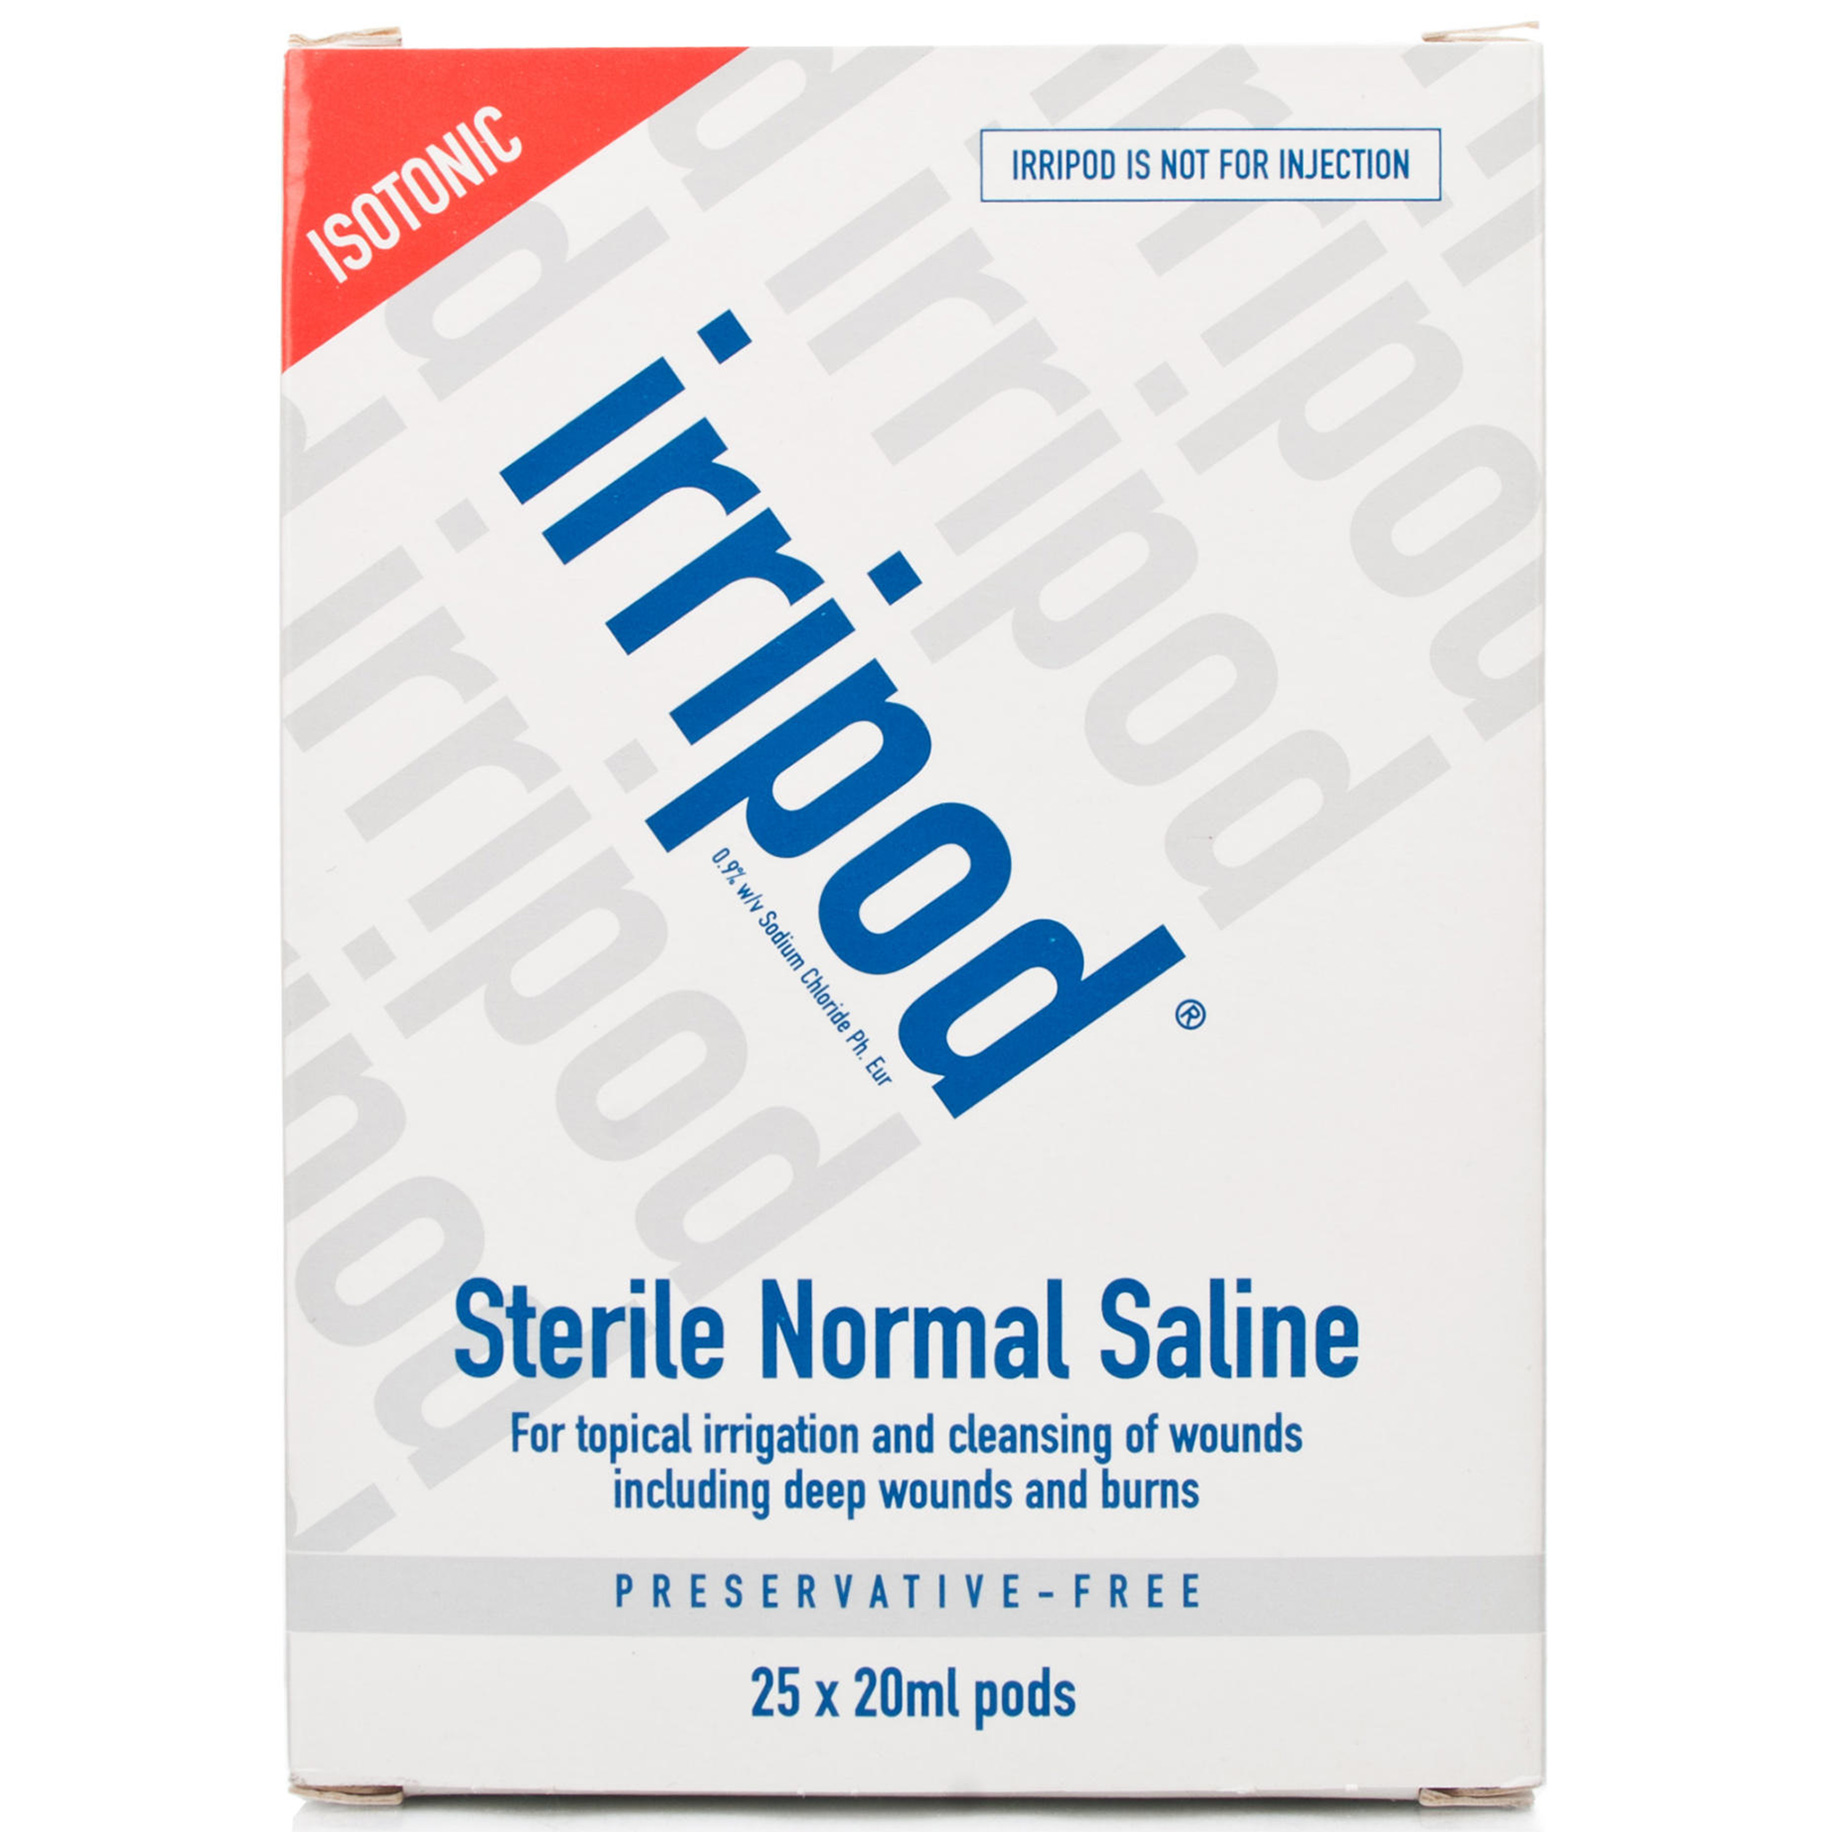 Irripod Saline Solution Pods 25 x 20ml Pack 25